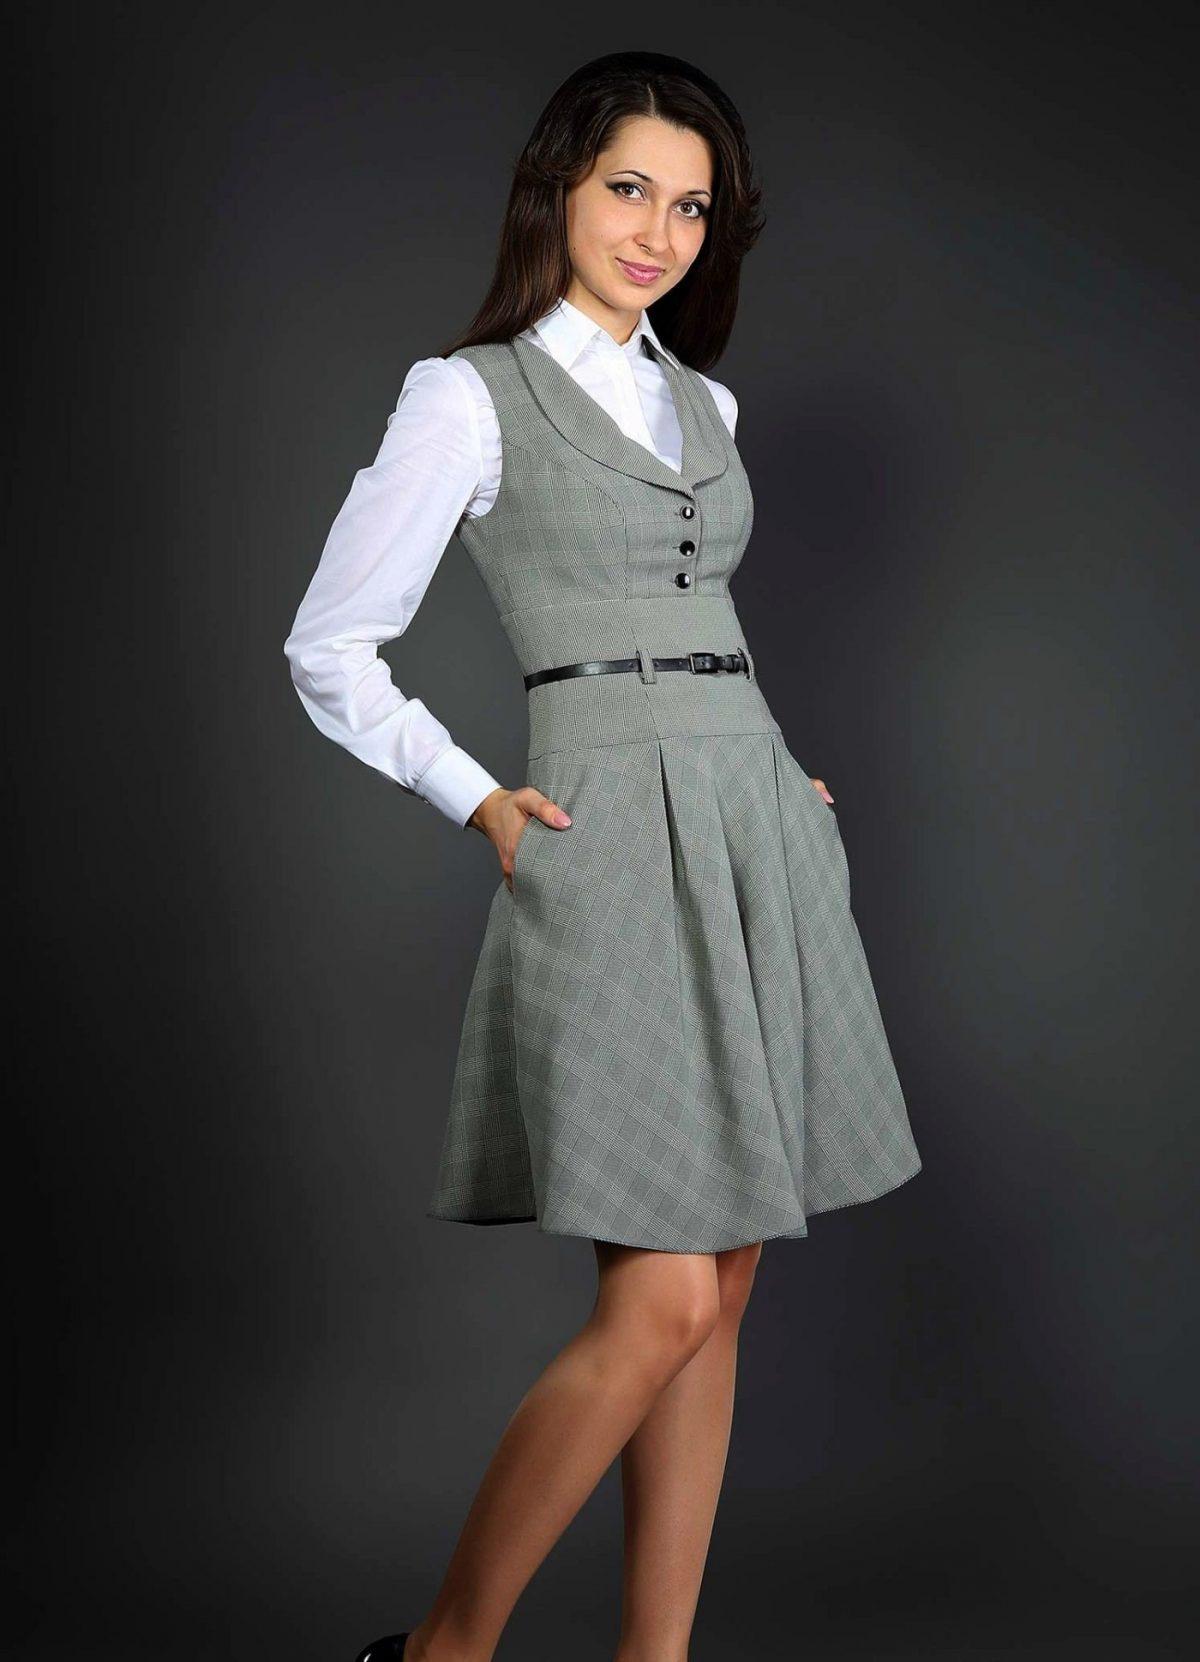 серое платье-сарафан и белая рубашка 2018